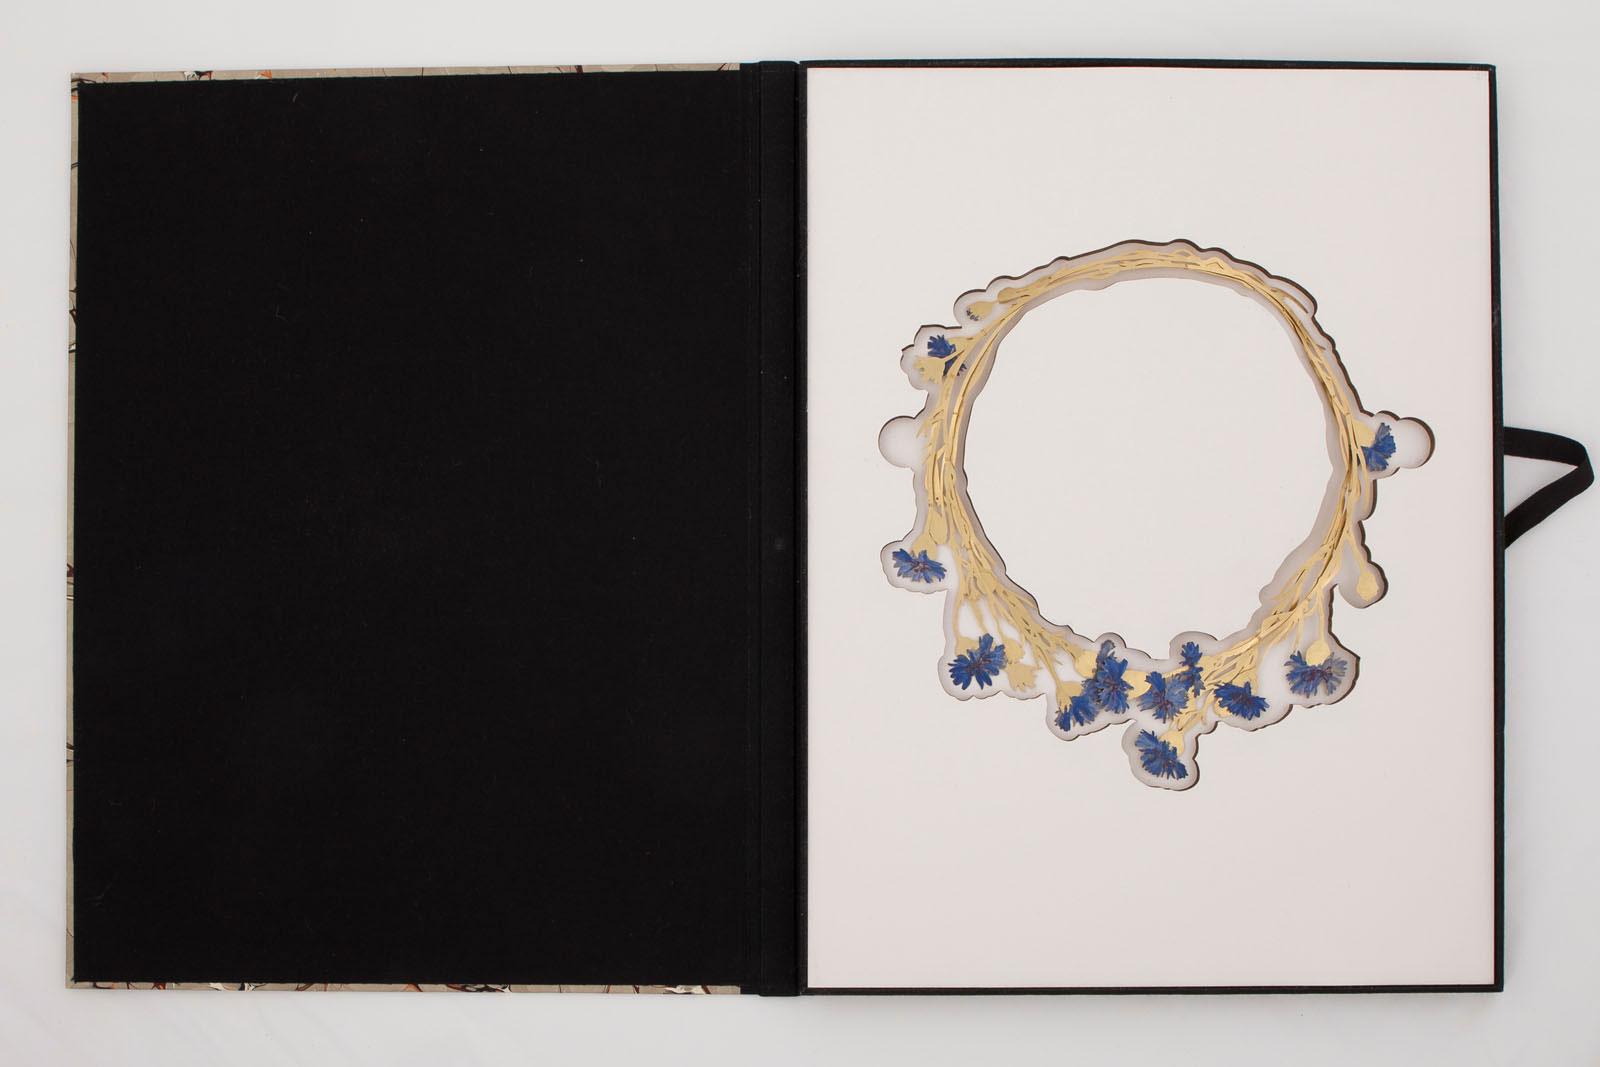 Christopher Thompson Royds, Natura Morta : Cornflowers, halssieraad, 2015, foto Galerie Marzee, goud, verf, karton, gemarmerd papier, lint